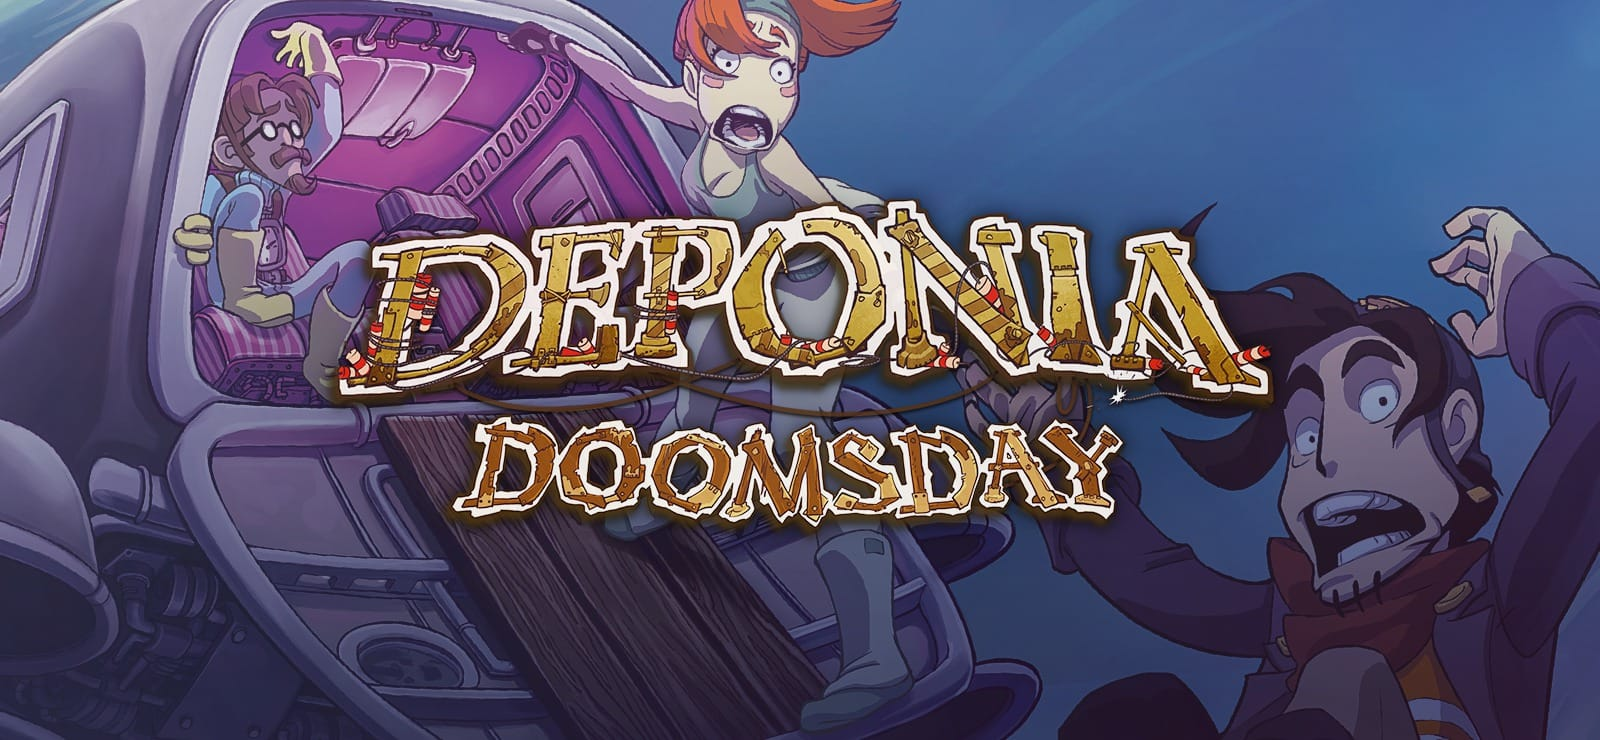 Deponia 4: Deponia Doomsday